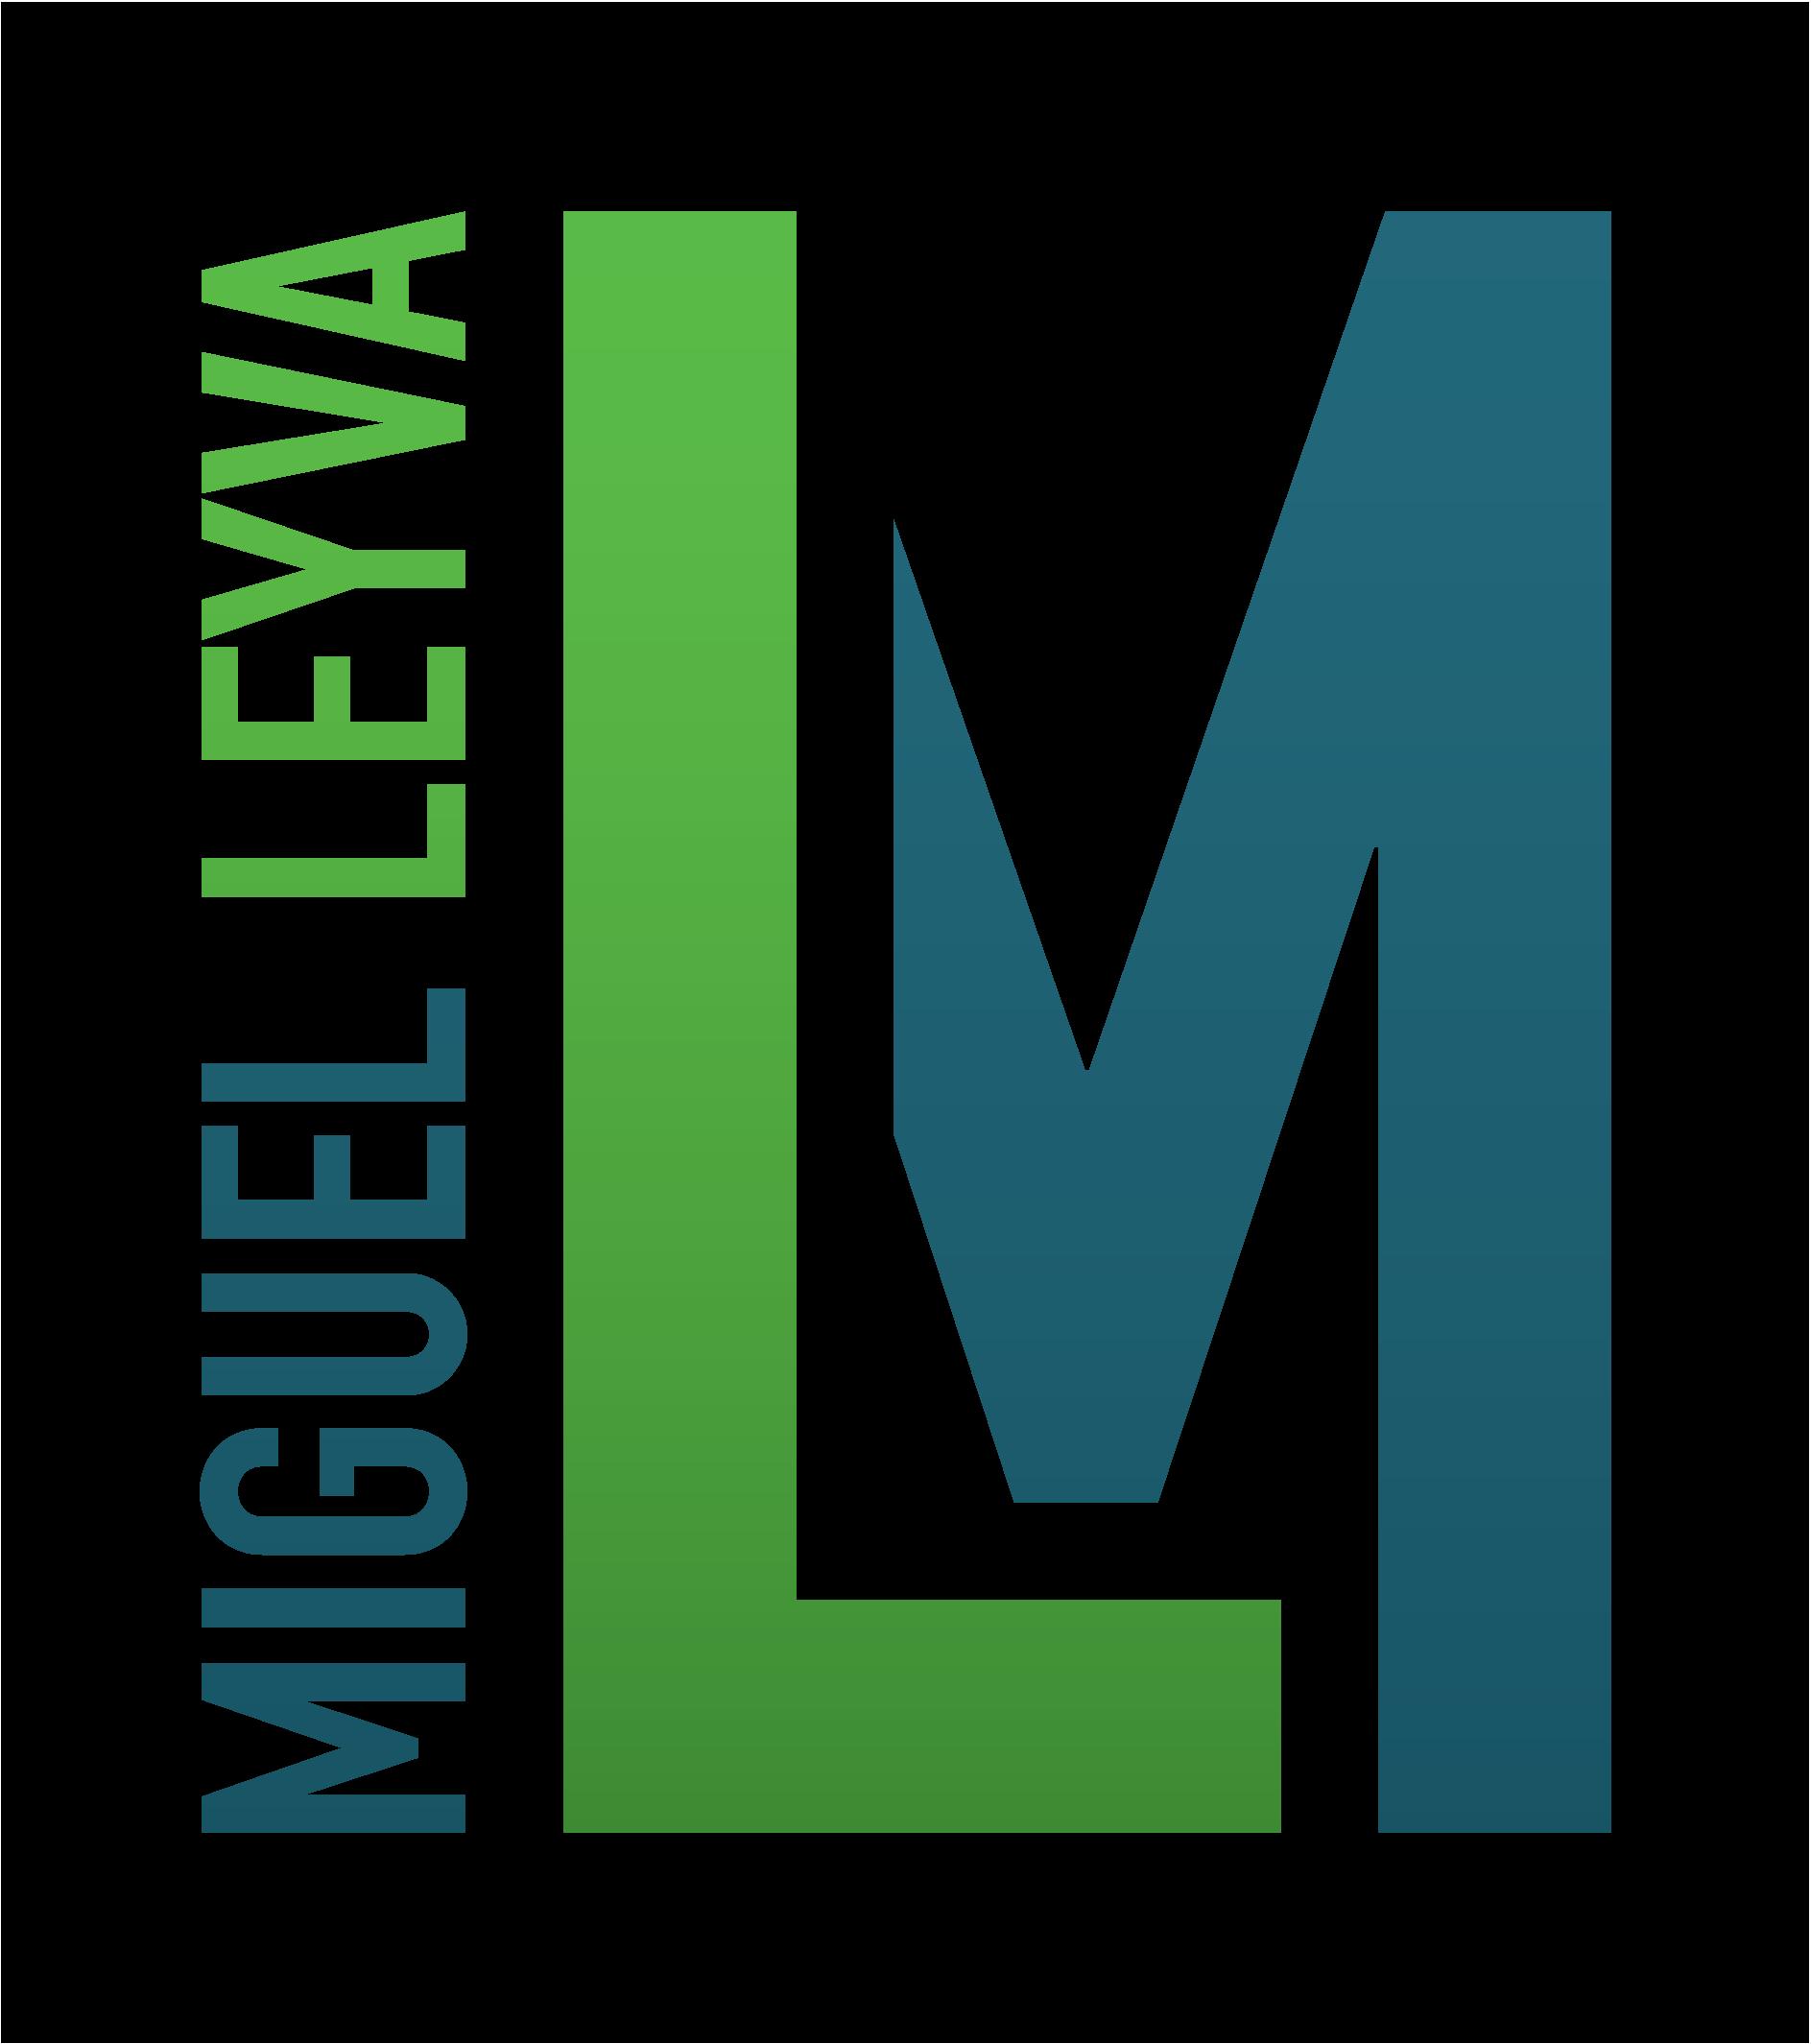 Miguel Leyva